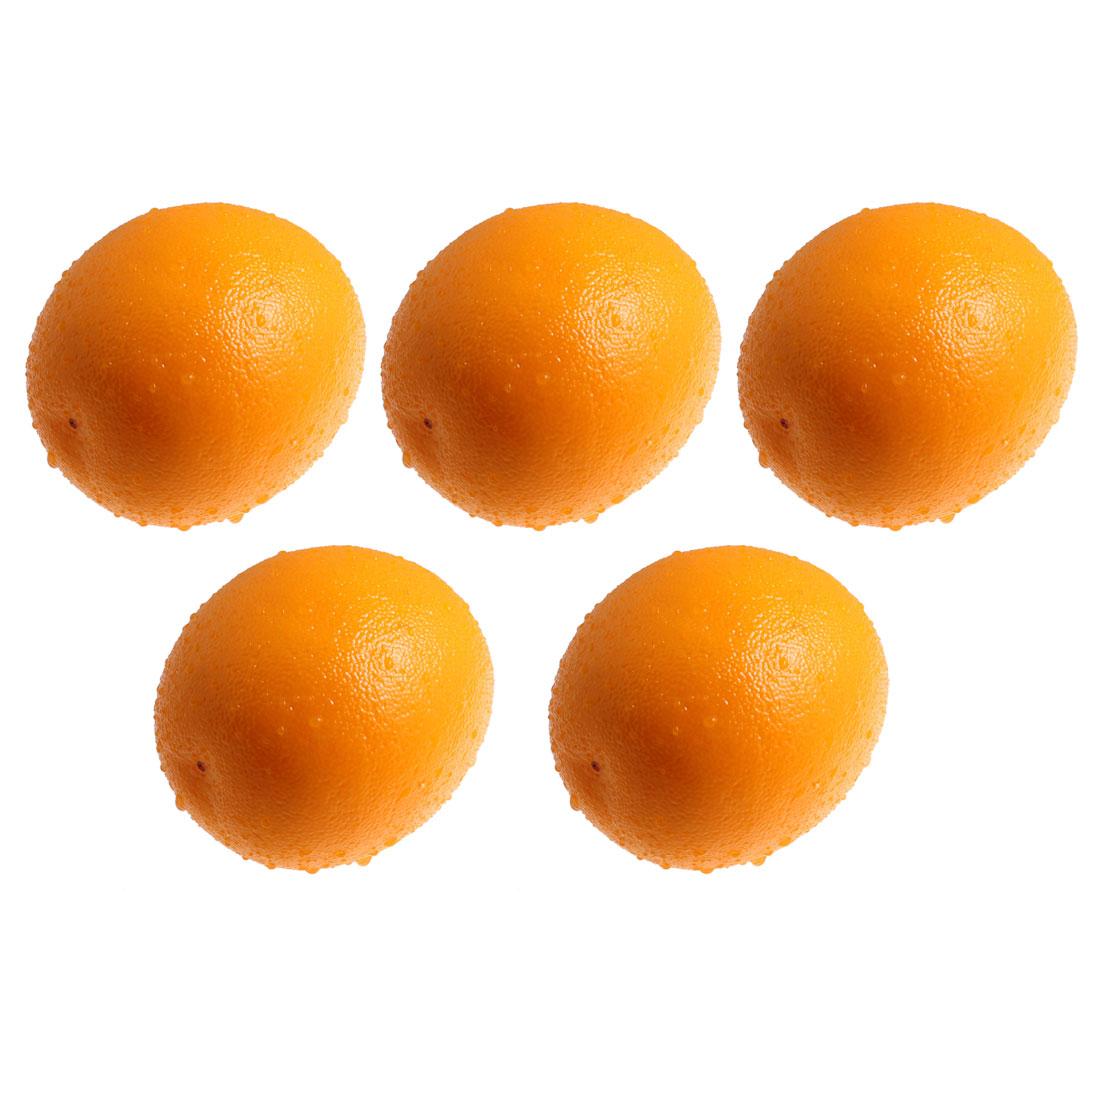 5 Pcs Foam Simulated Orange Ornament Cabinet Table Desk Display Fruit